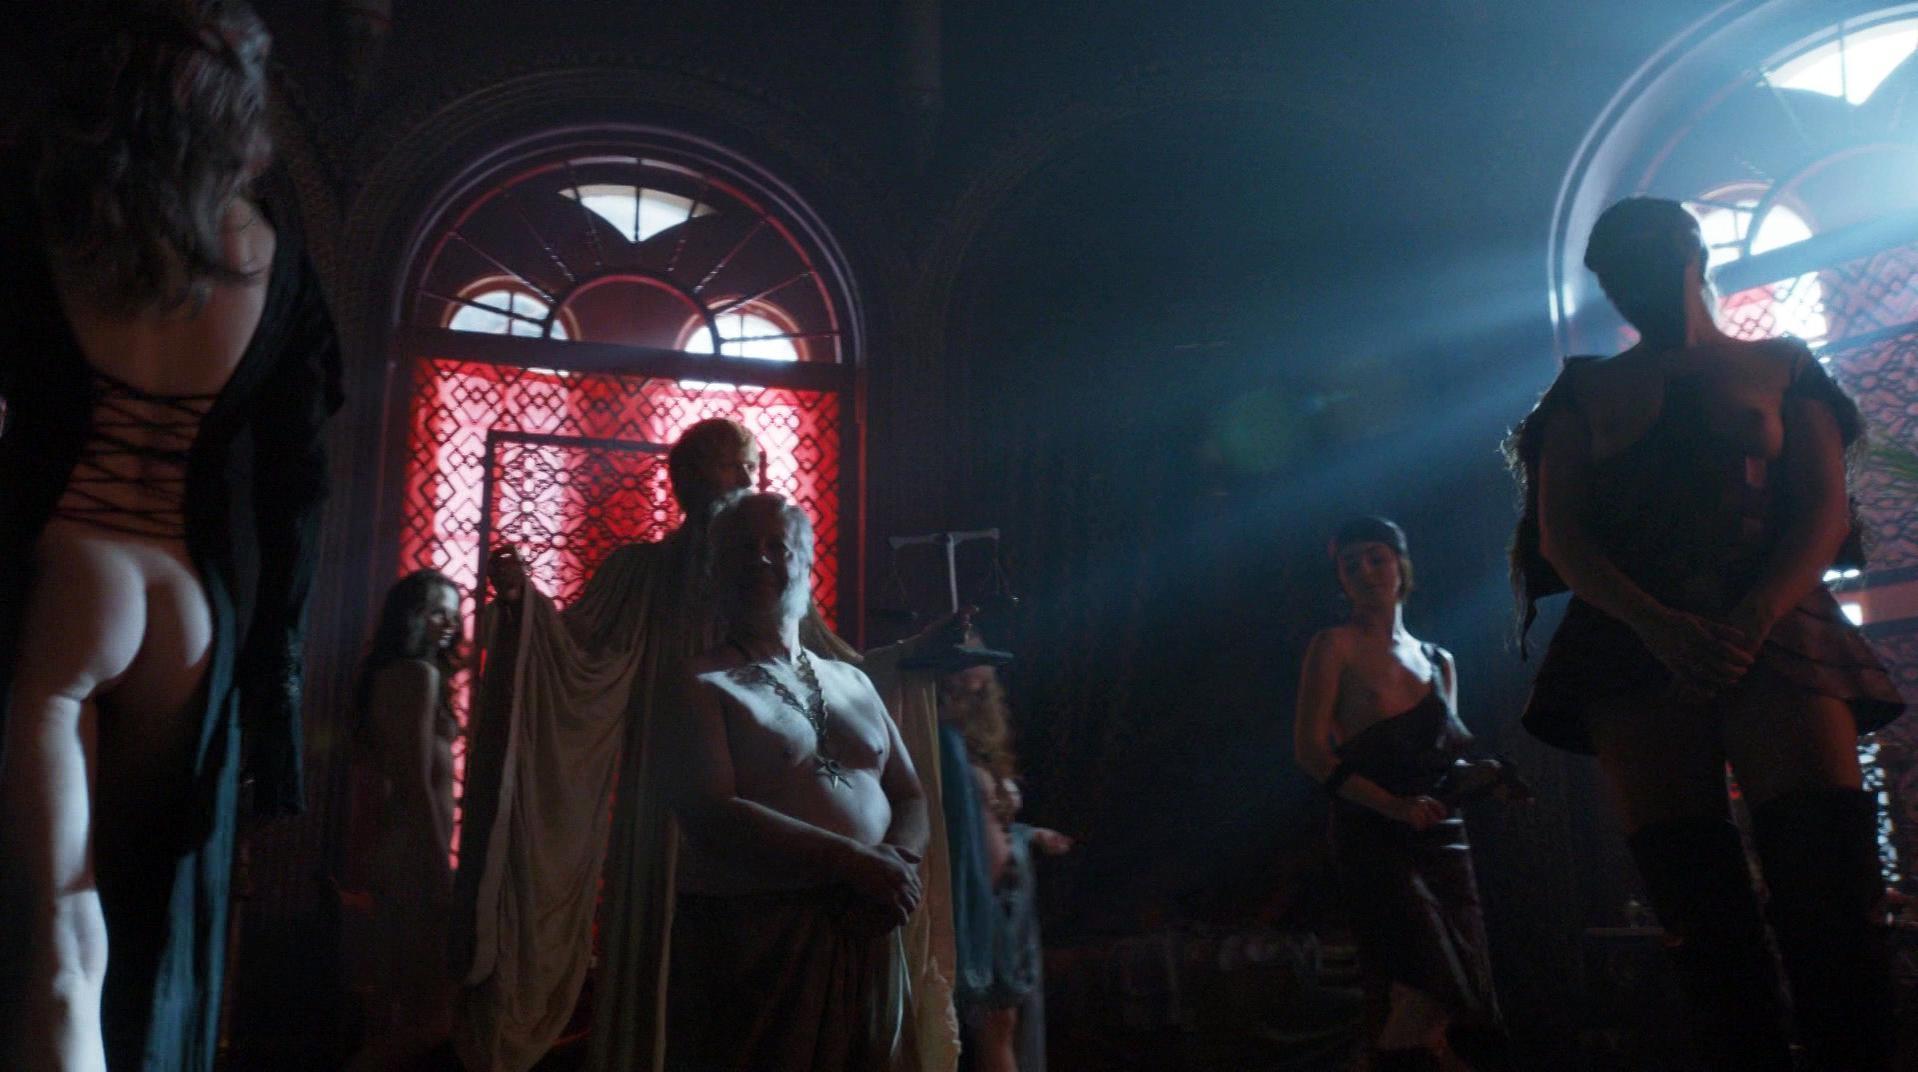 Natalie Dormer sexy, Xena Avramidis nude - Game of Thrones s05e03 (2015)